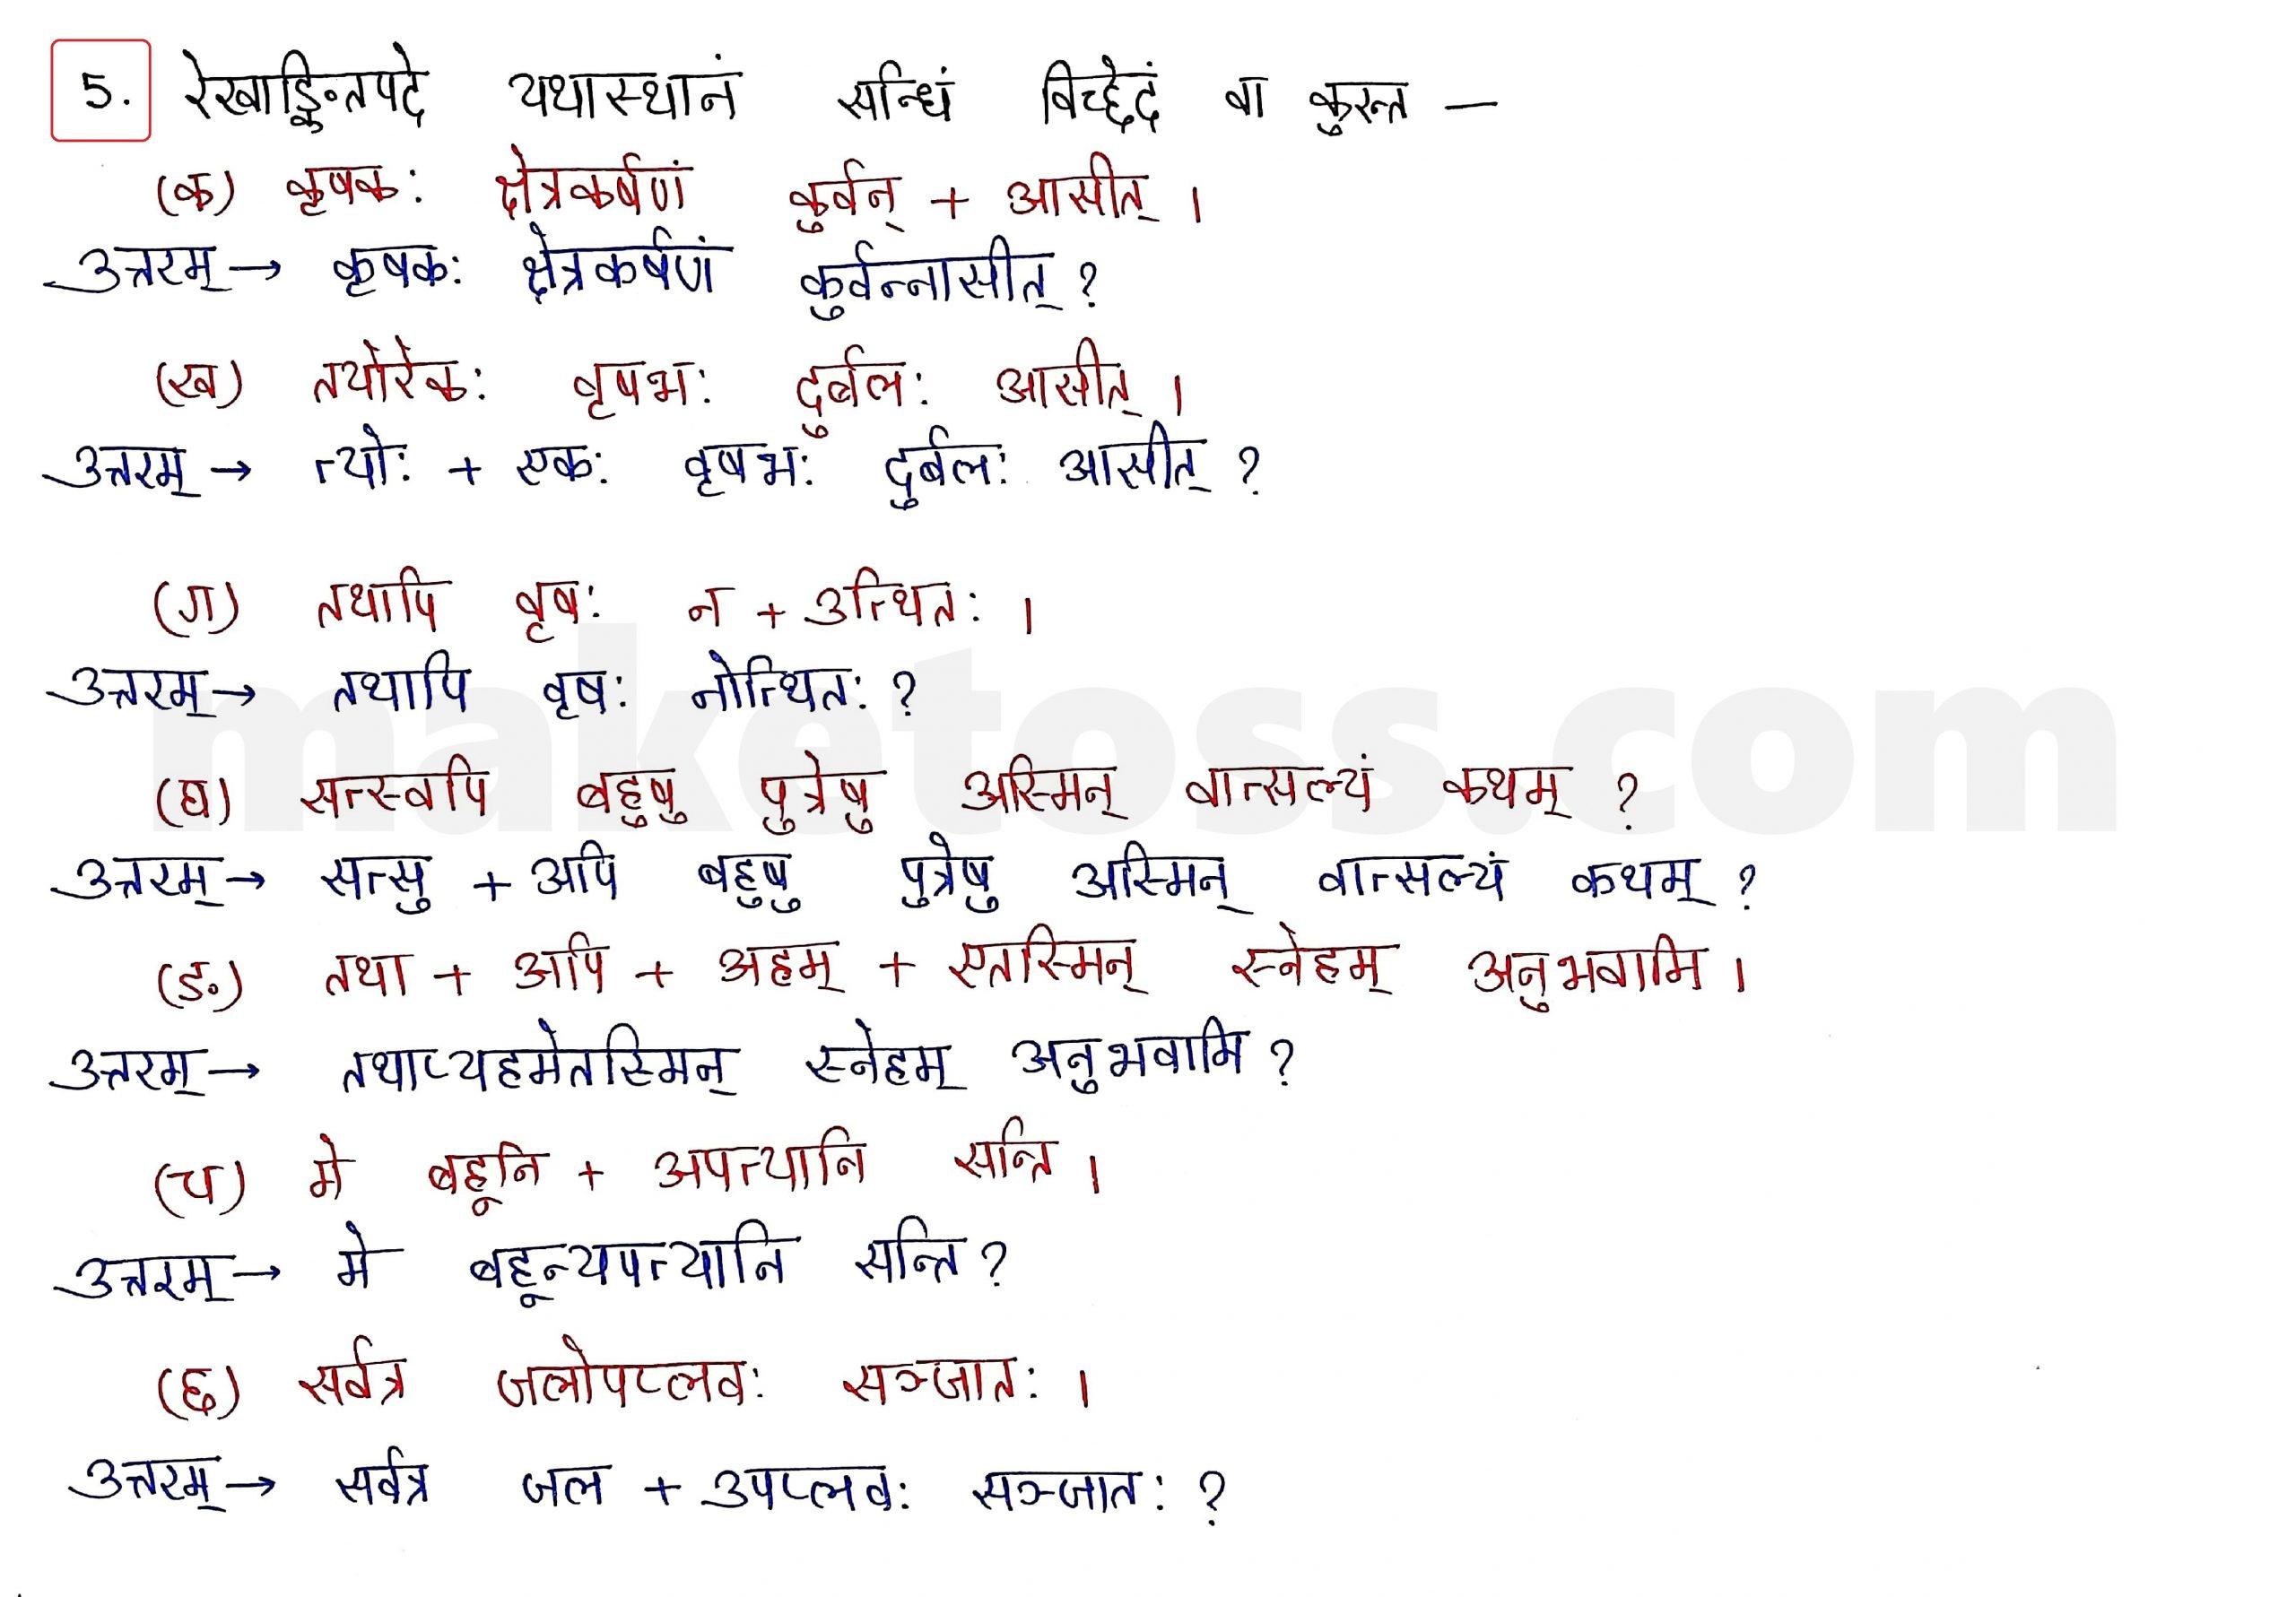 Sanskrit Class 10 - Chapter 5 - जननी तुल्यवत्सला  - Question 5 with Answer